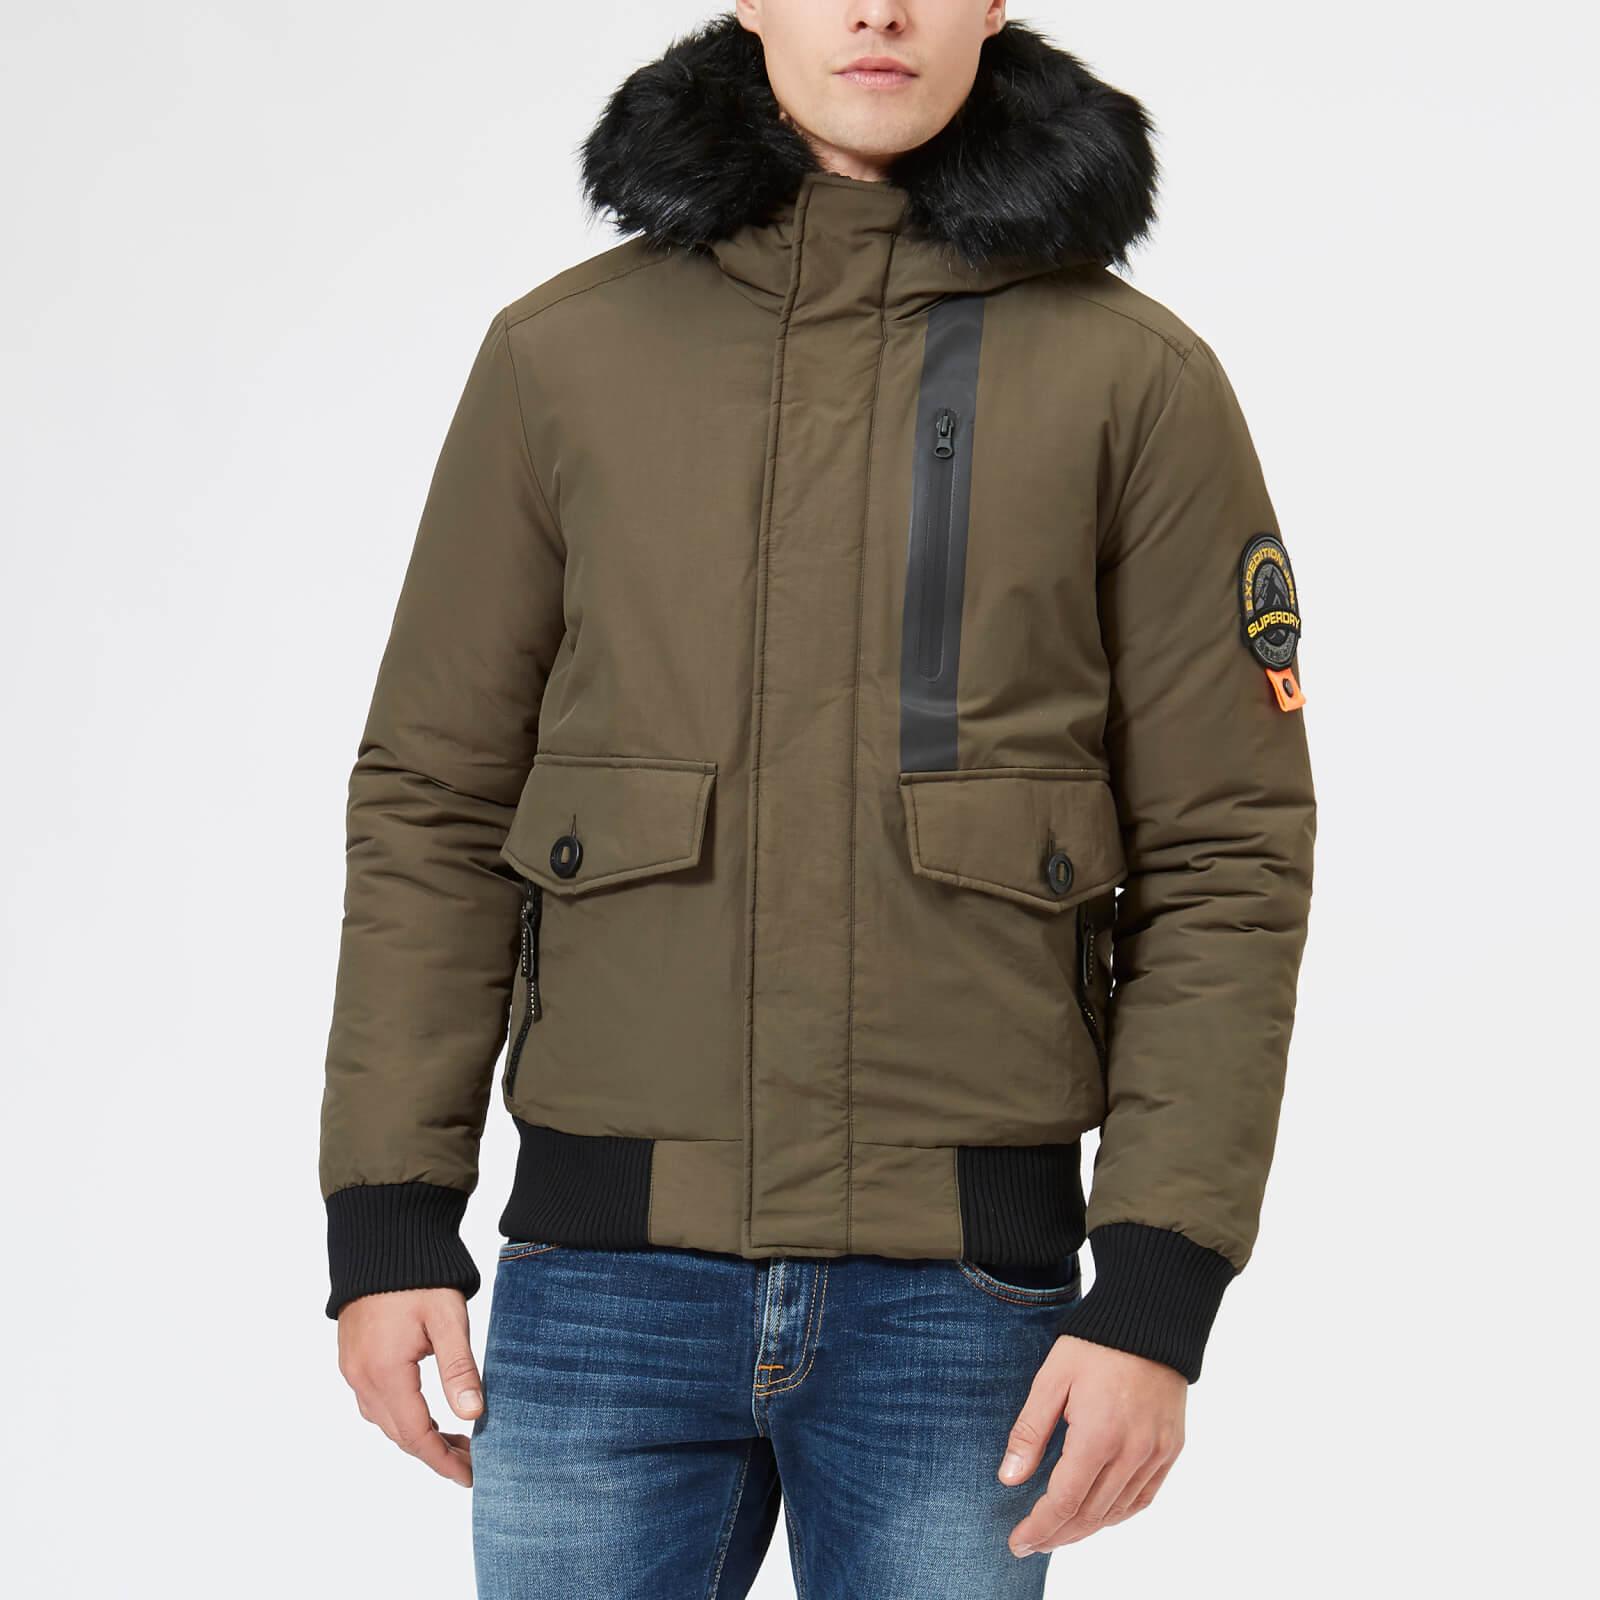 Superdry Men's Everest Bomber Jacket Khaki